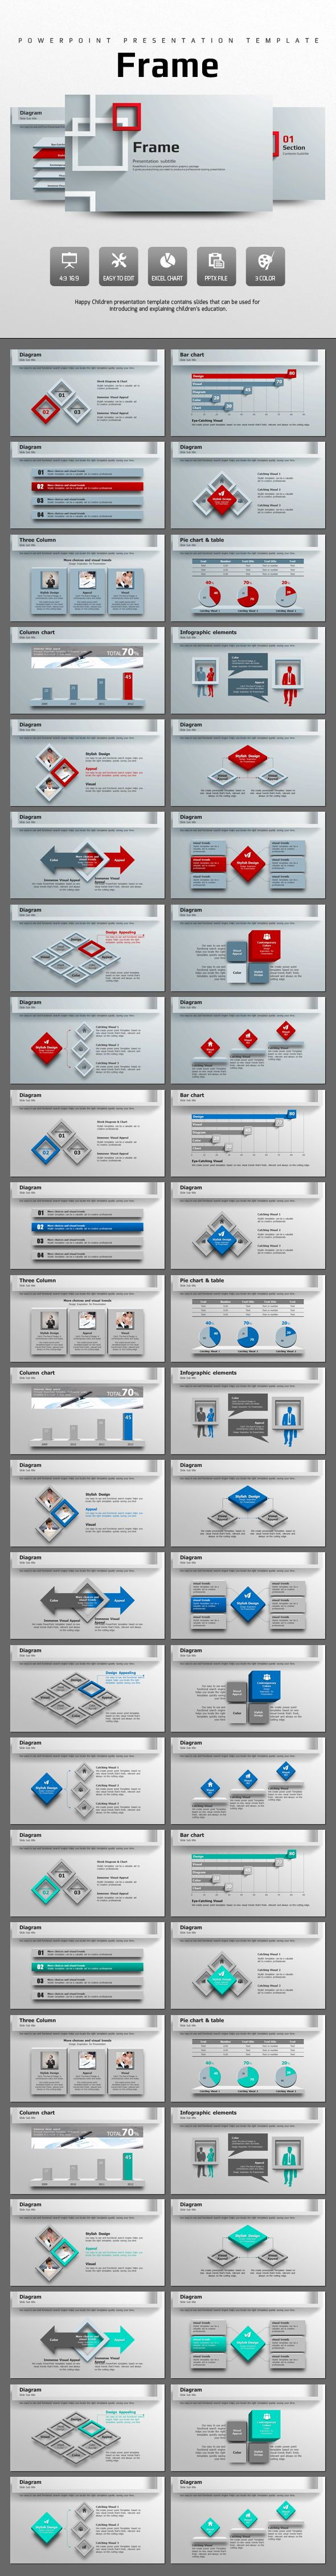 Frame PowerPoint Template #design #slides #presentation Download: http://graphicriver.net/item/frame-/13120007?ref=ksioks